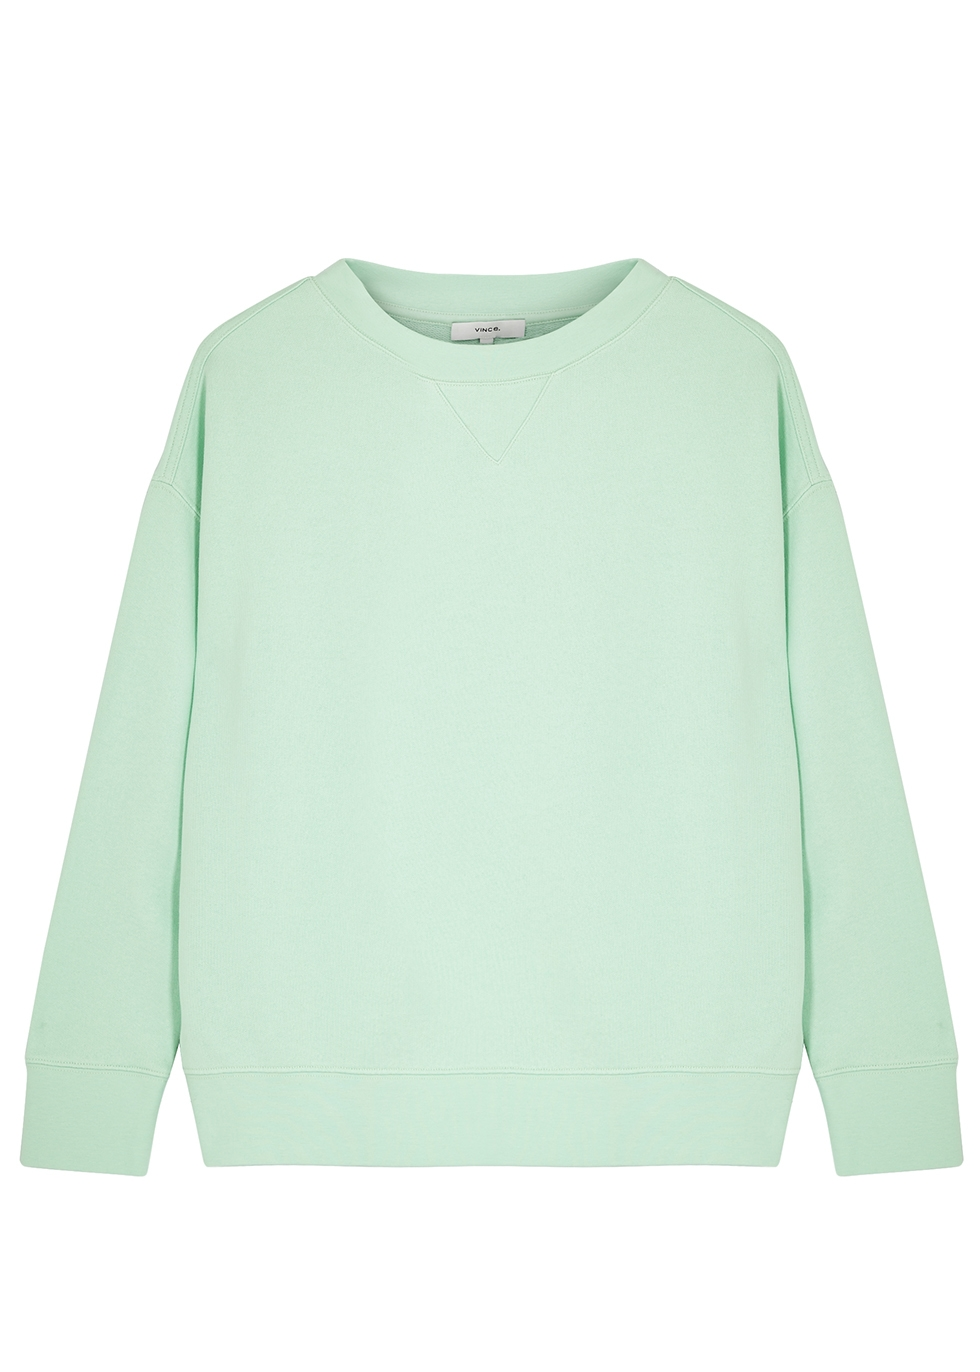 Mint cotton sweatshirt